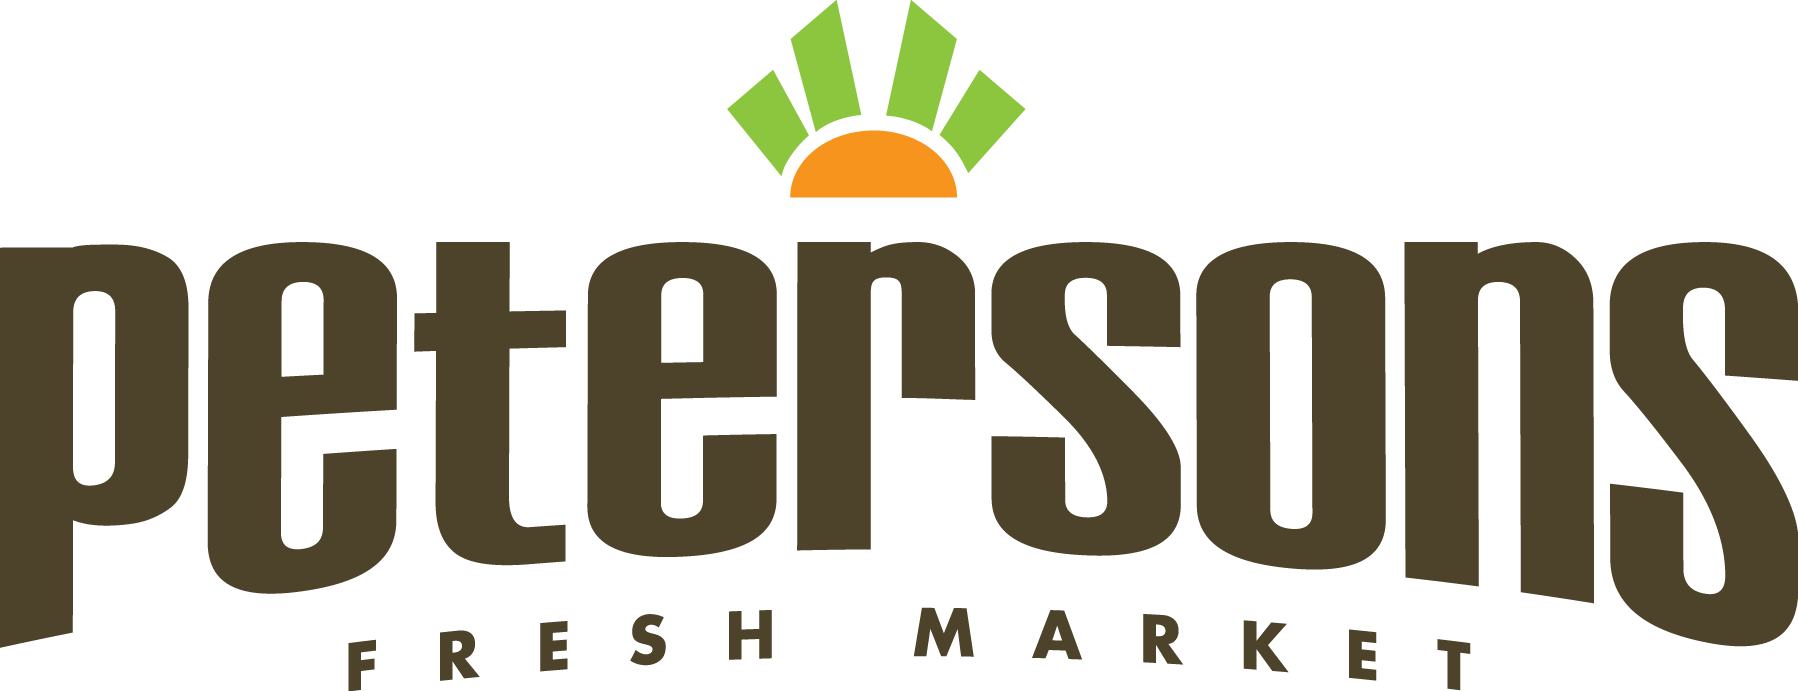 Peterson's Fresh Market Logo